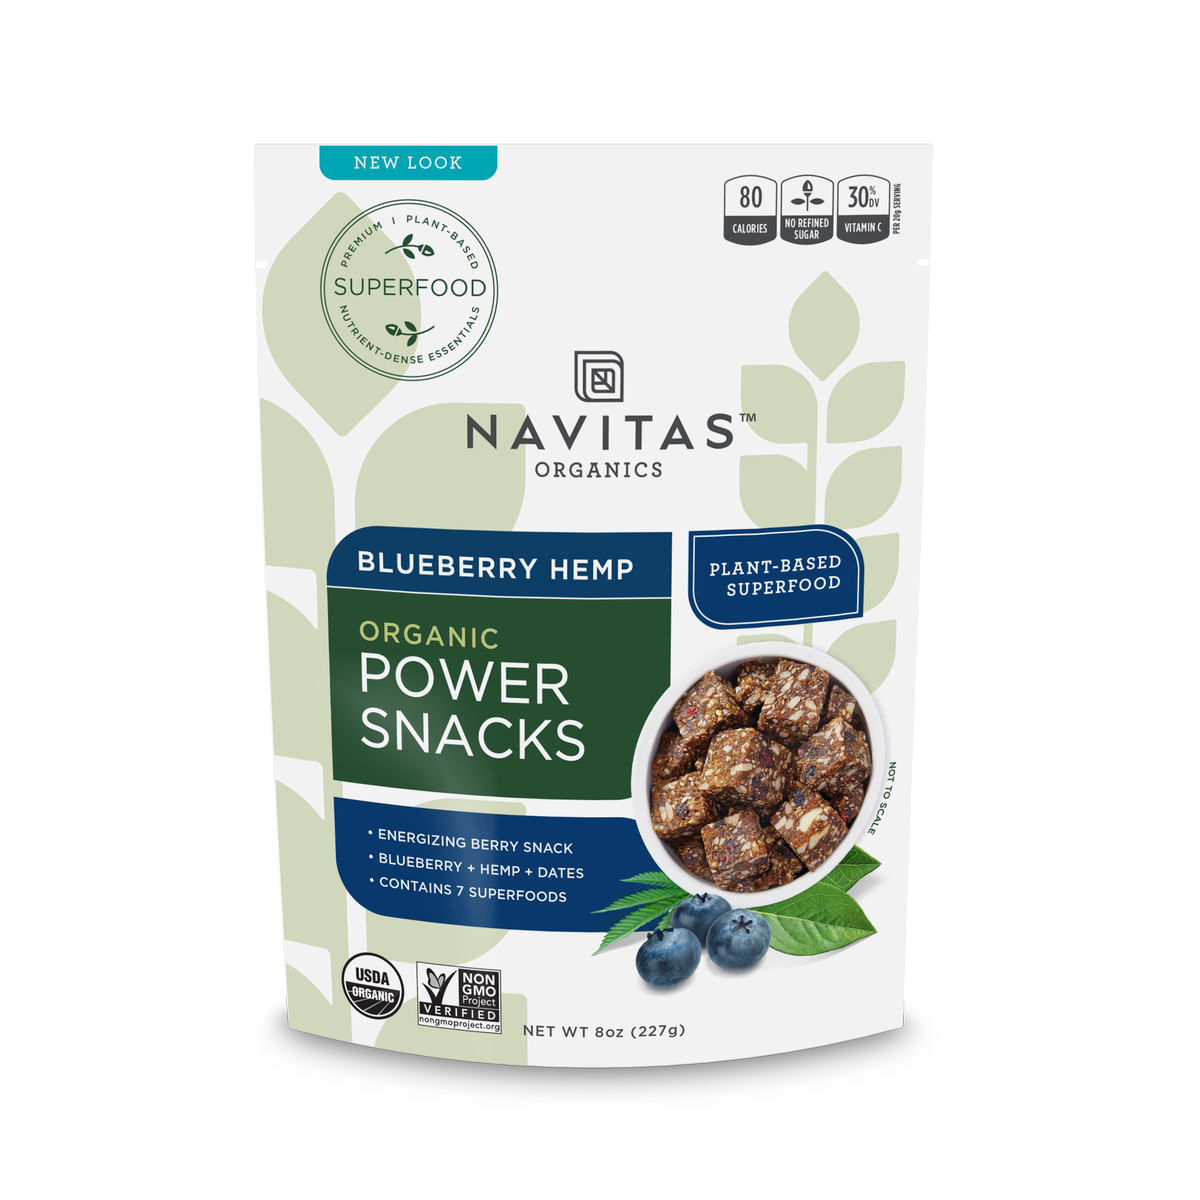 Navitas Organics Power Snacks, Blueberry Hemp, 8.0 Oz, 11 Servings